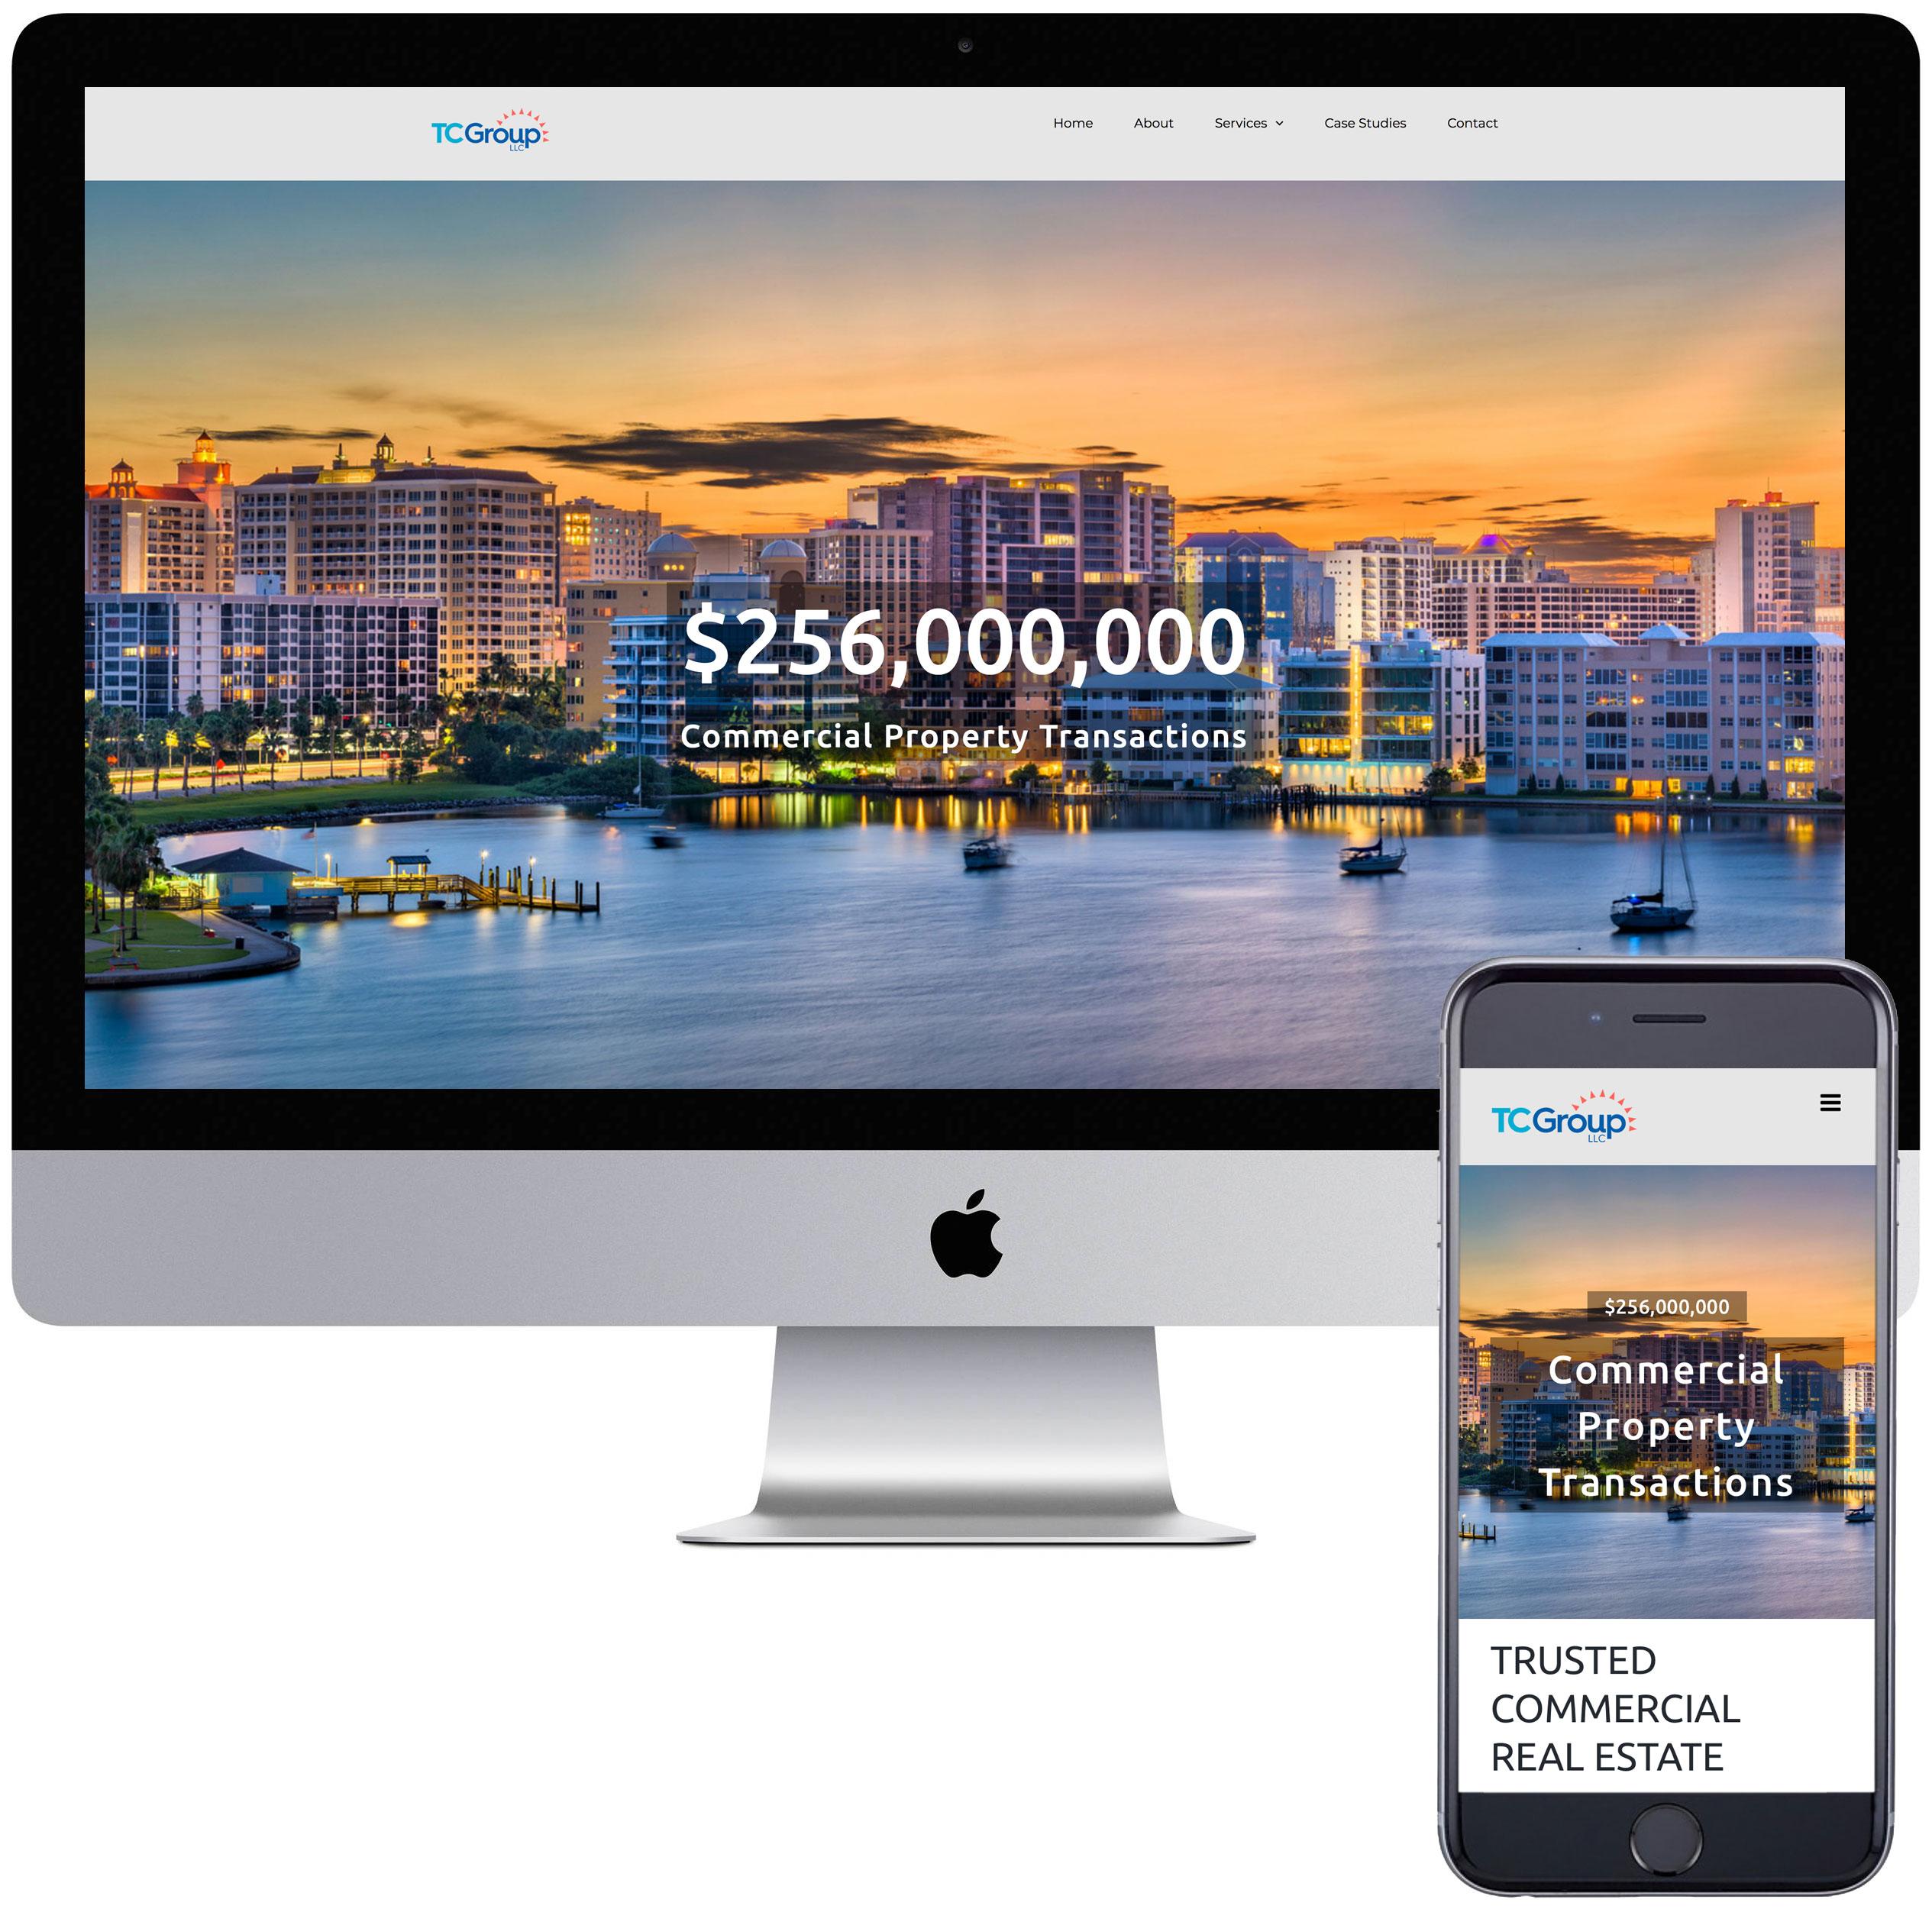 TC Group website.